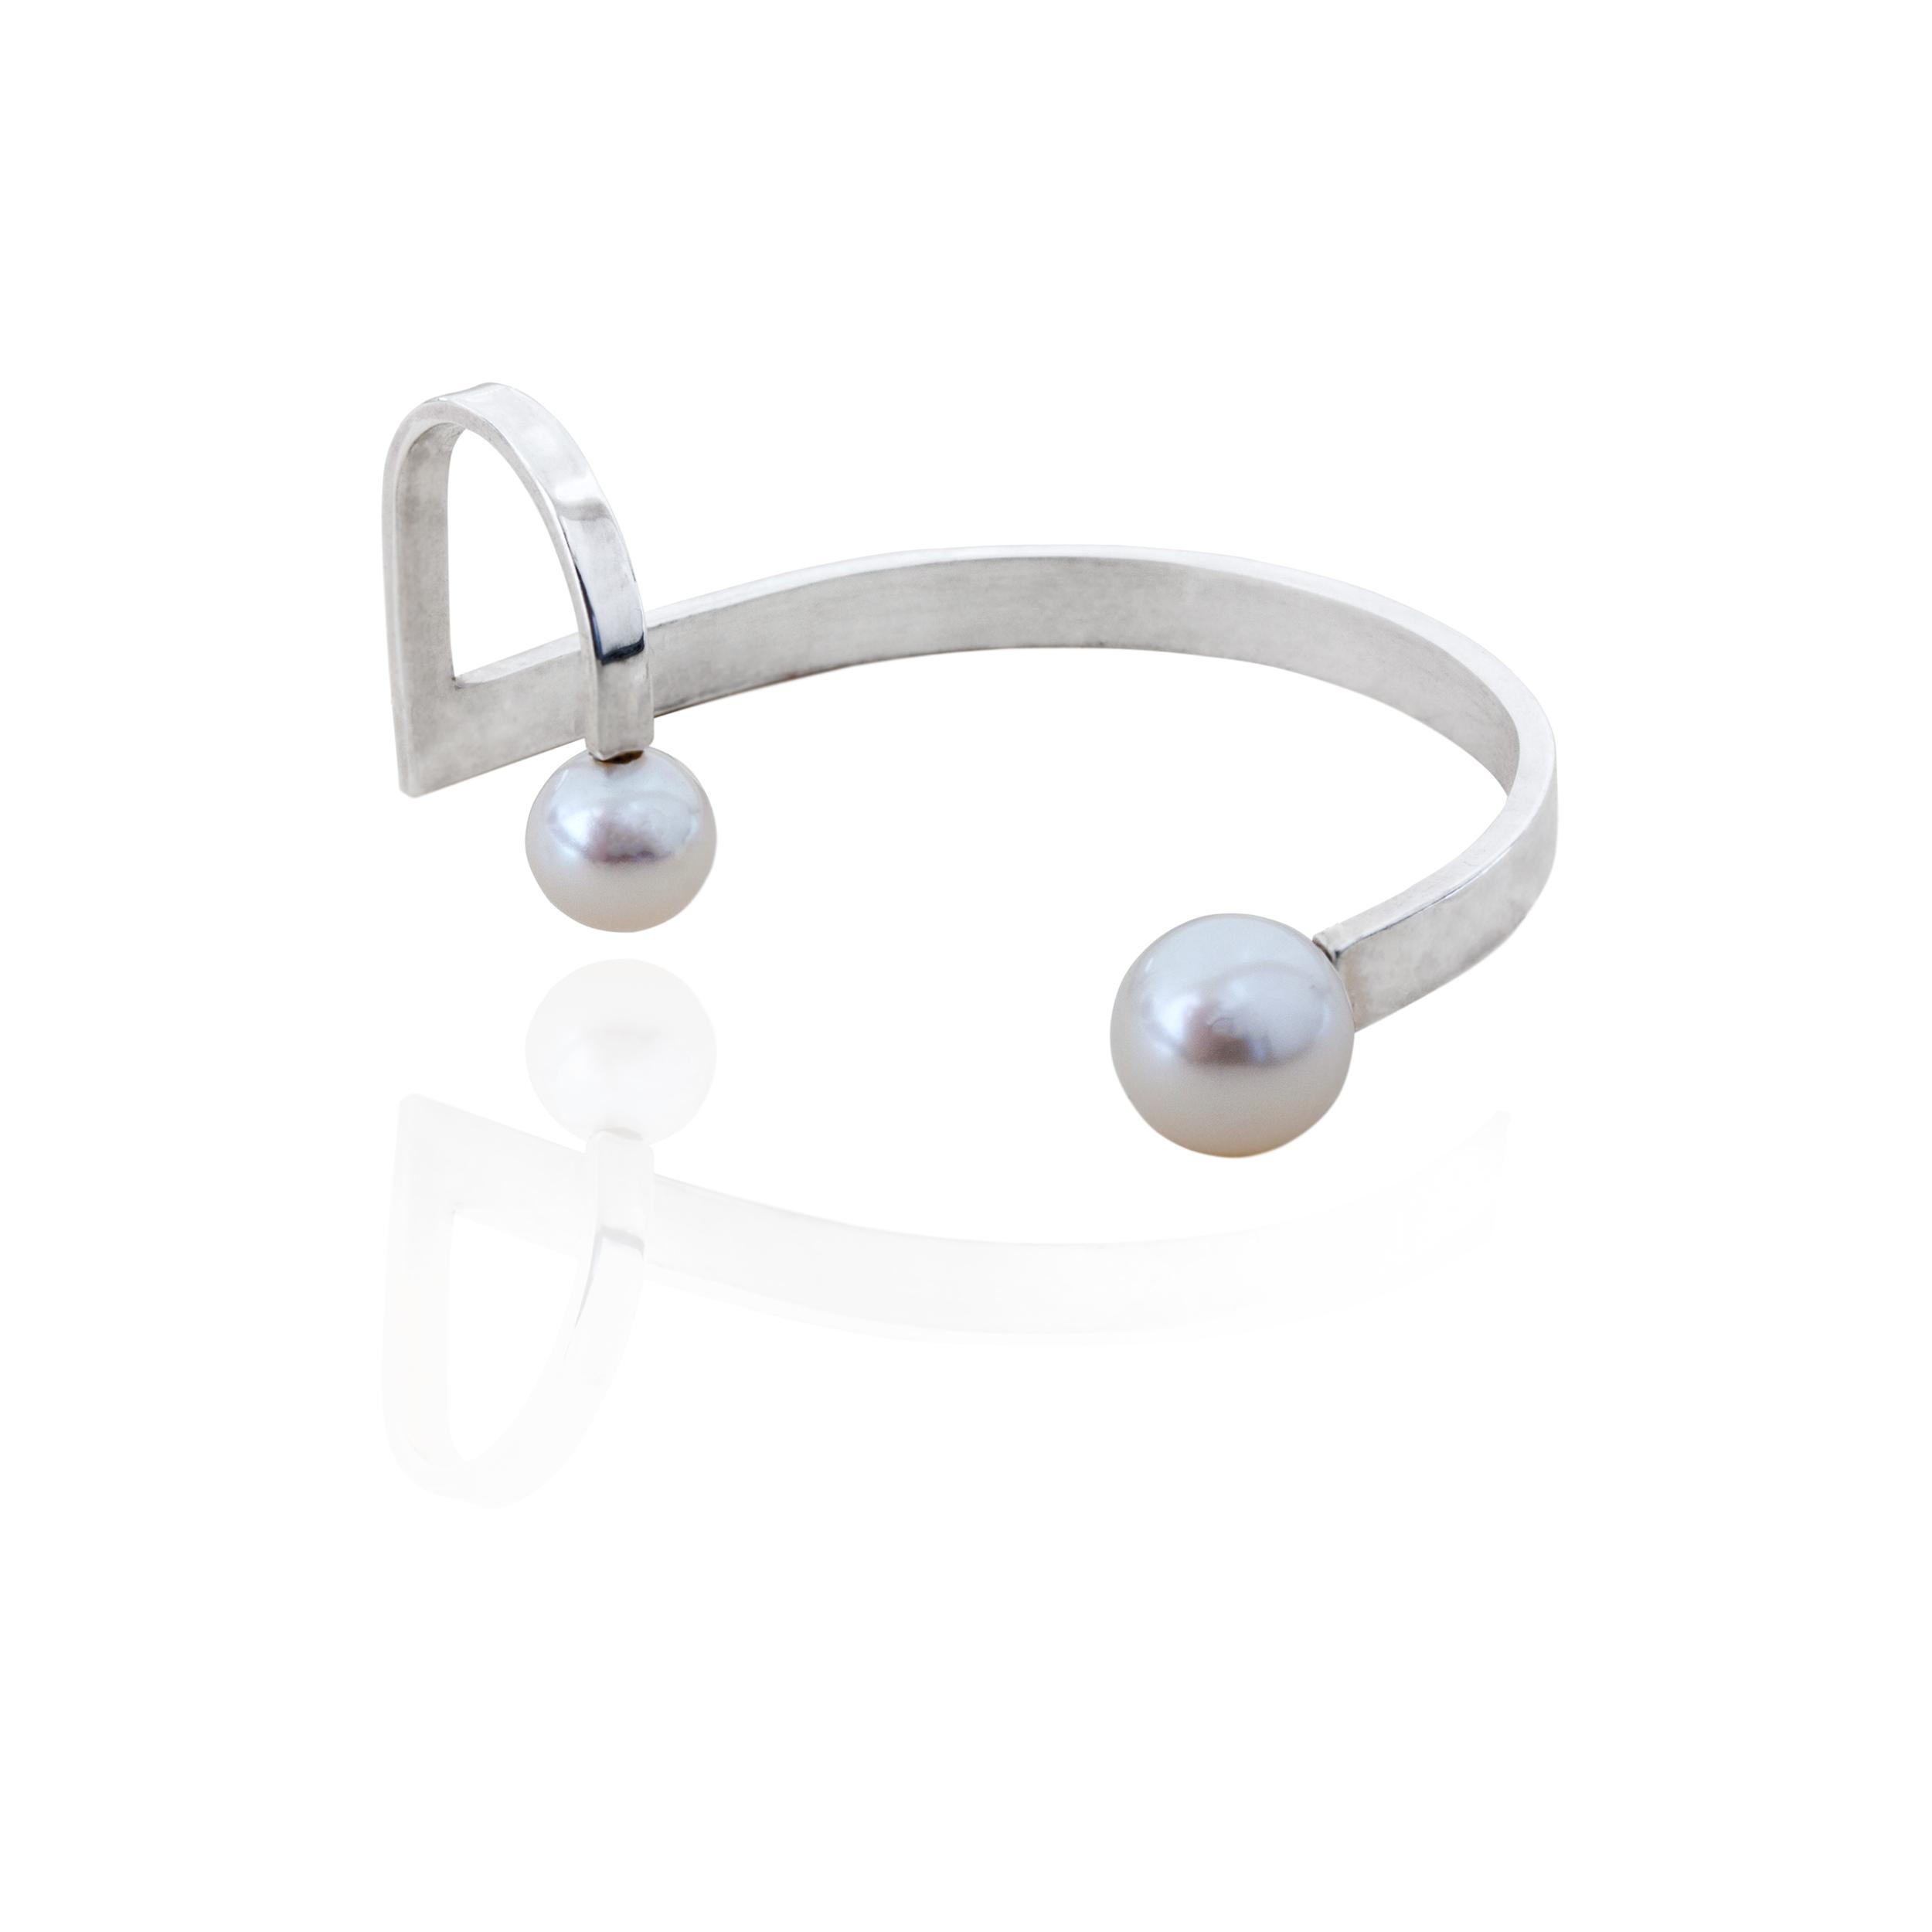 dorry hsu pearl silver jewellery by HSU .jpeg